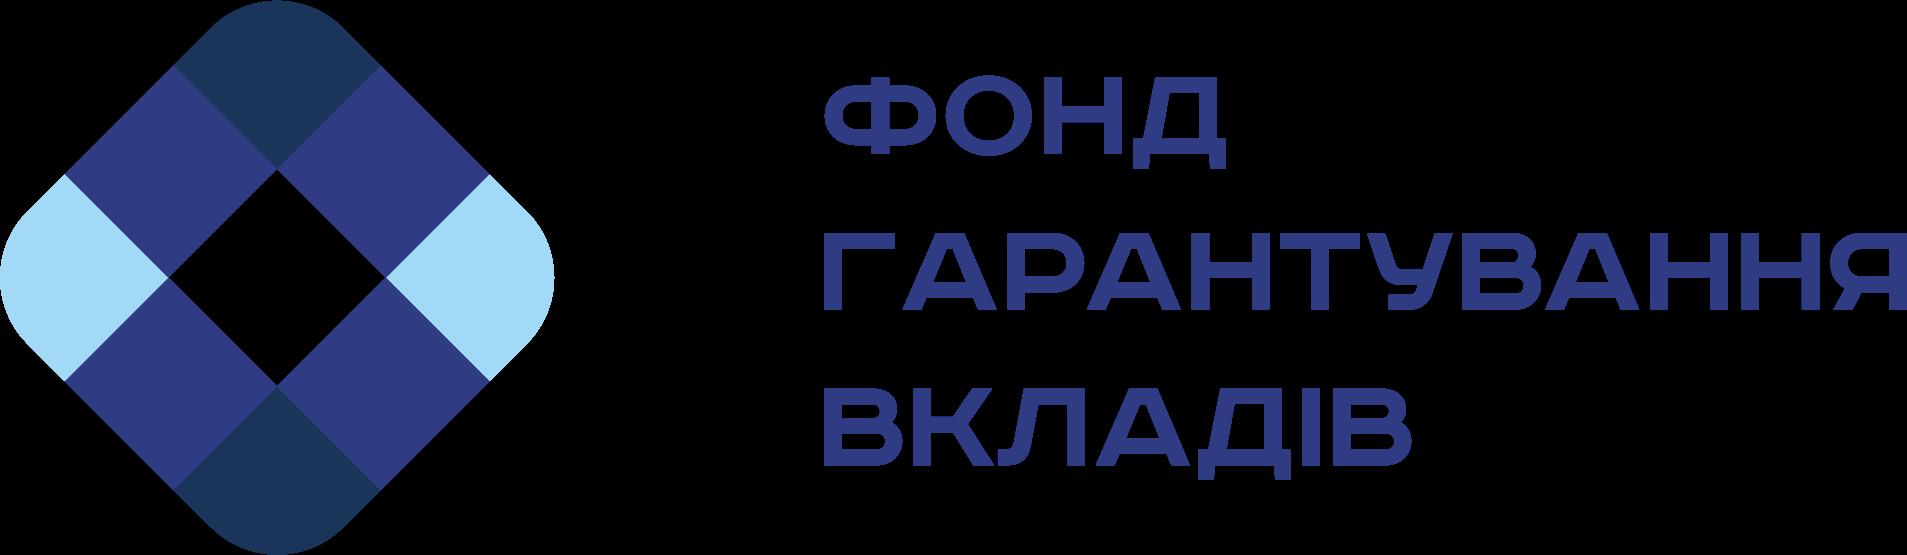 bitmap logo